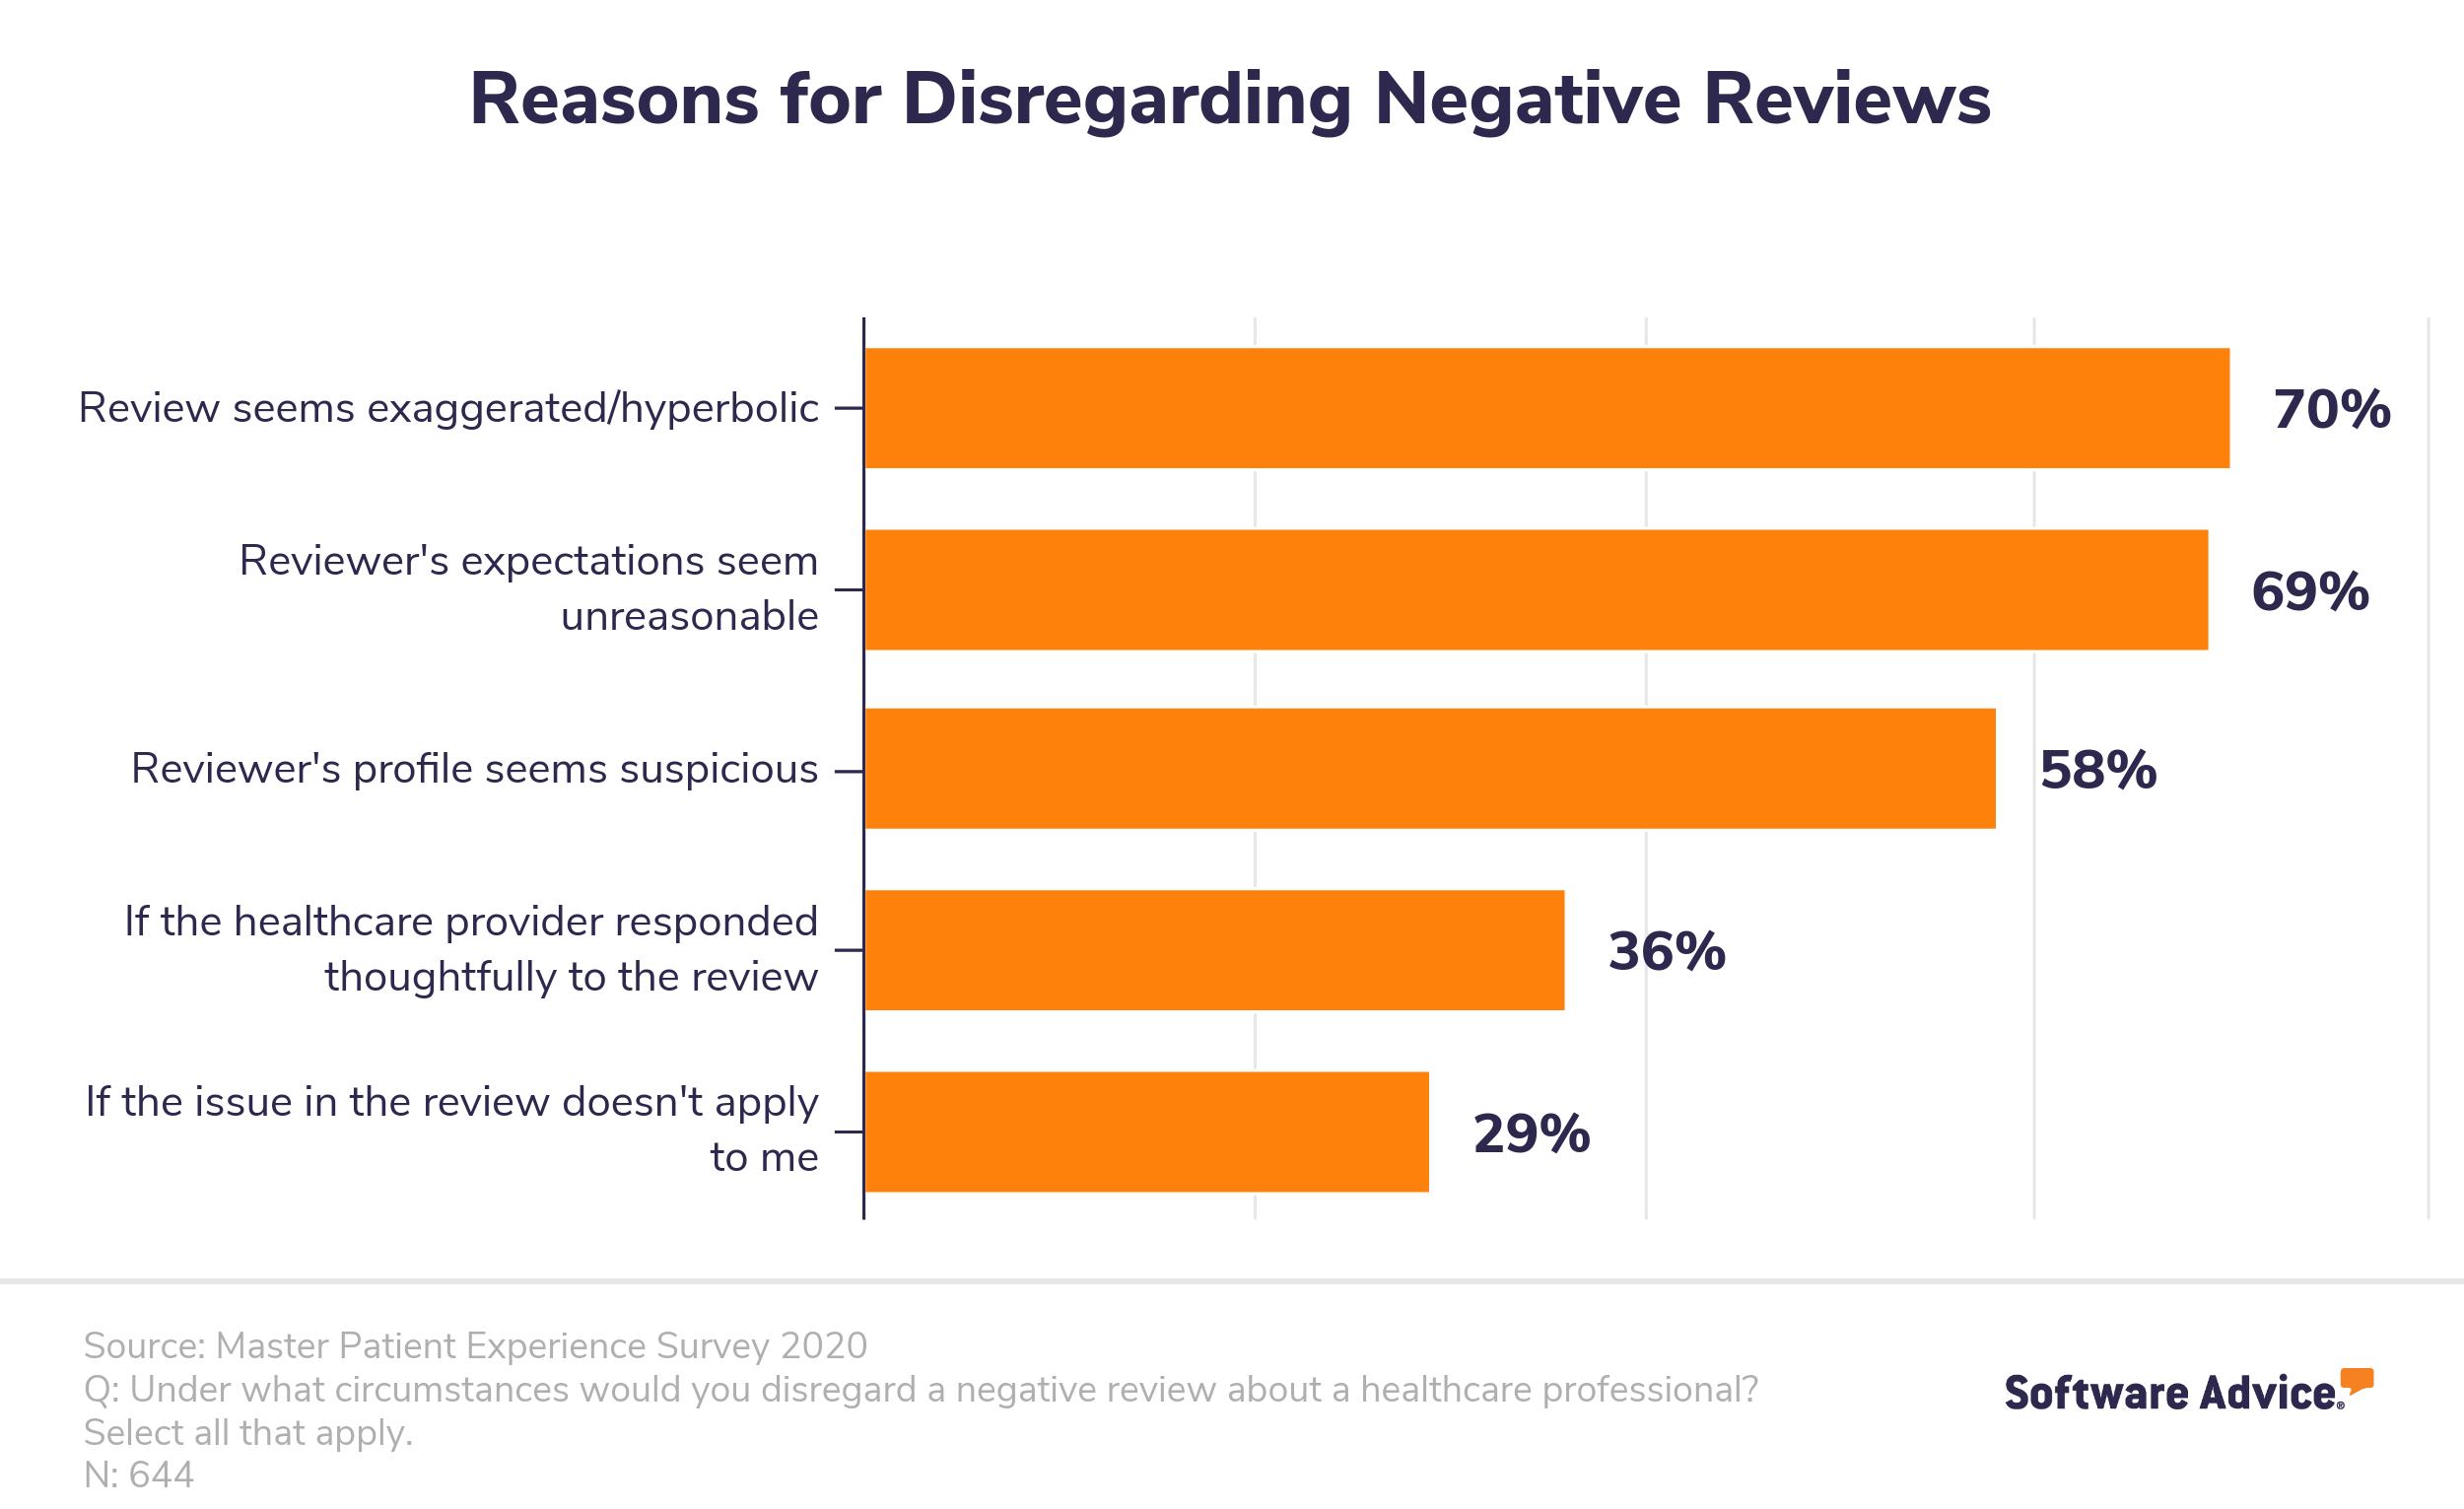 Reasons for disregarding negative online reviews